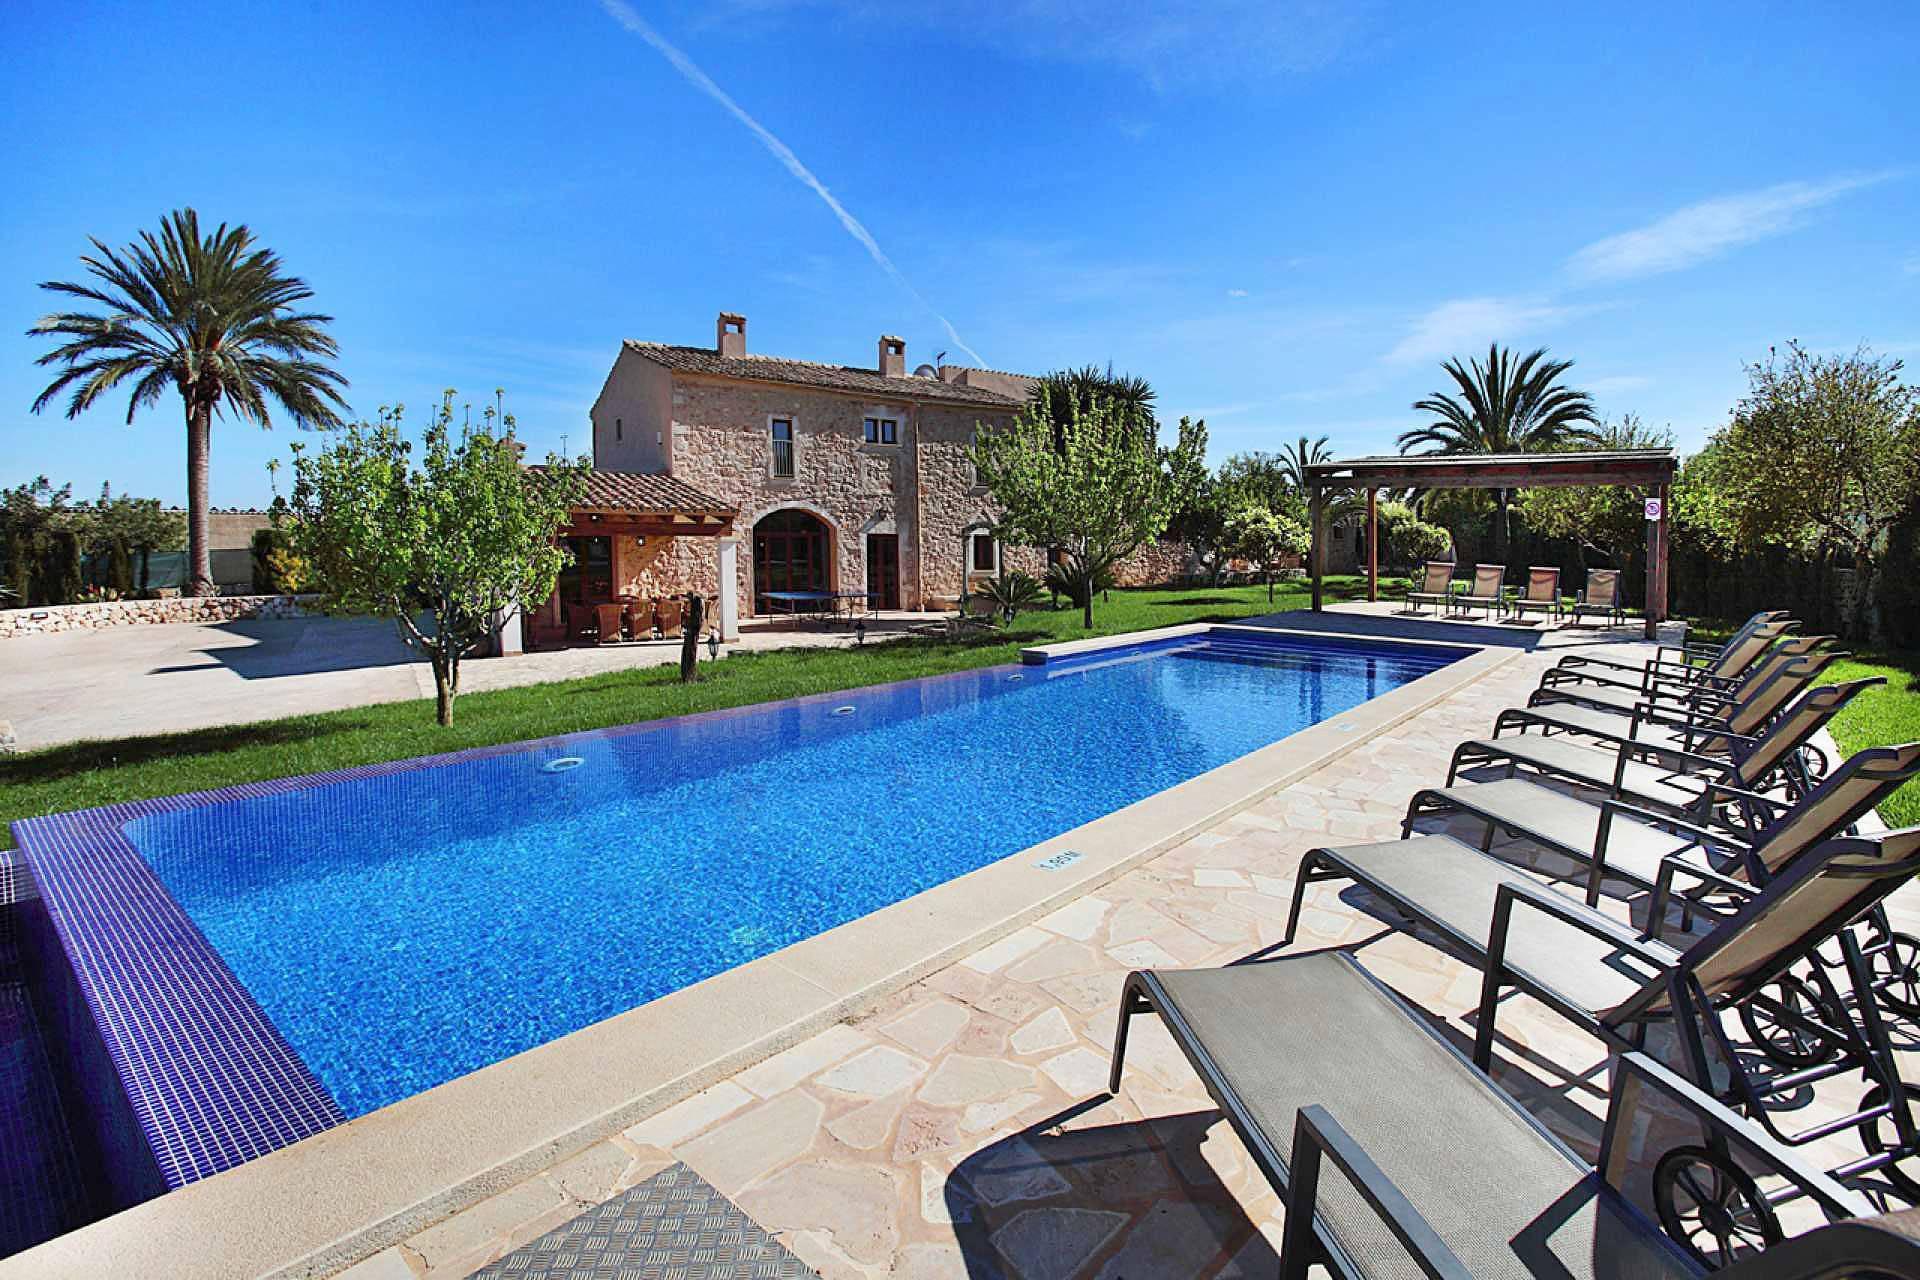 01-33 Spacious holiday home Mallorca East Bild 1